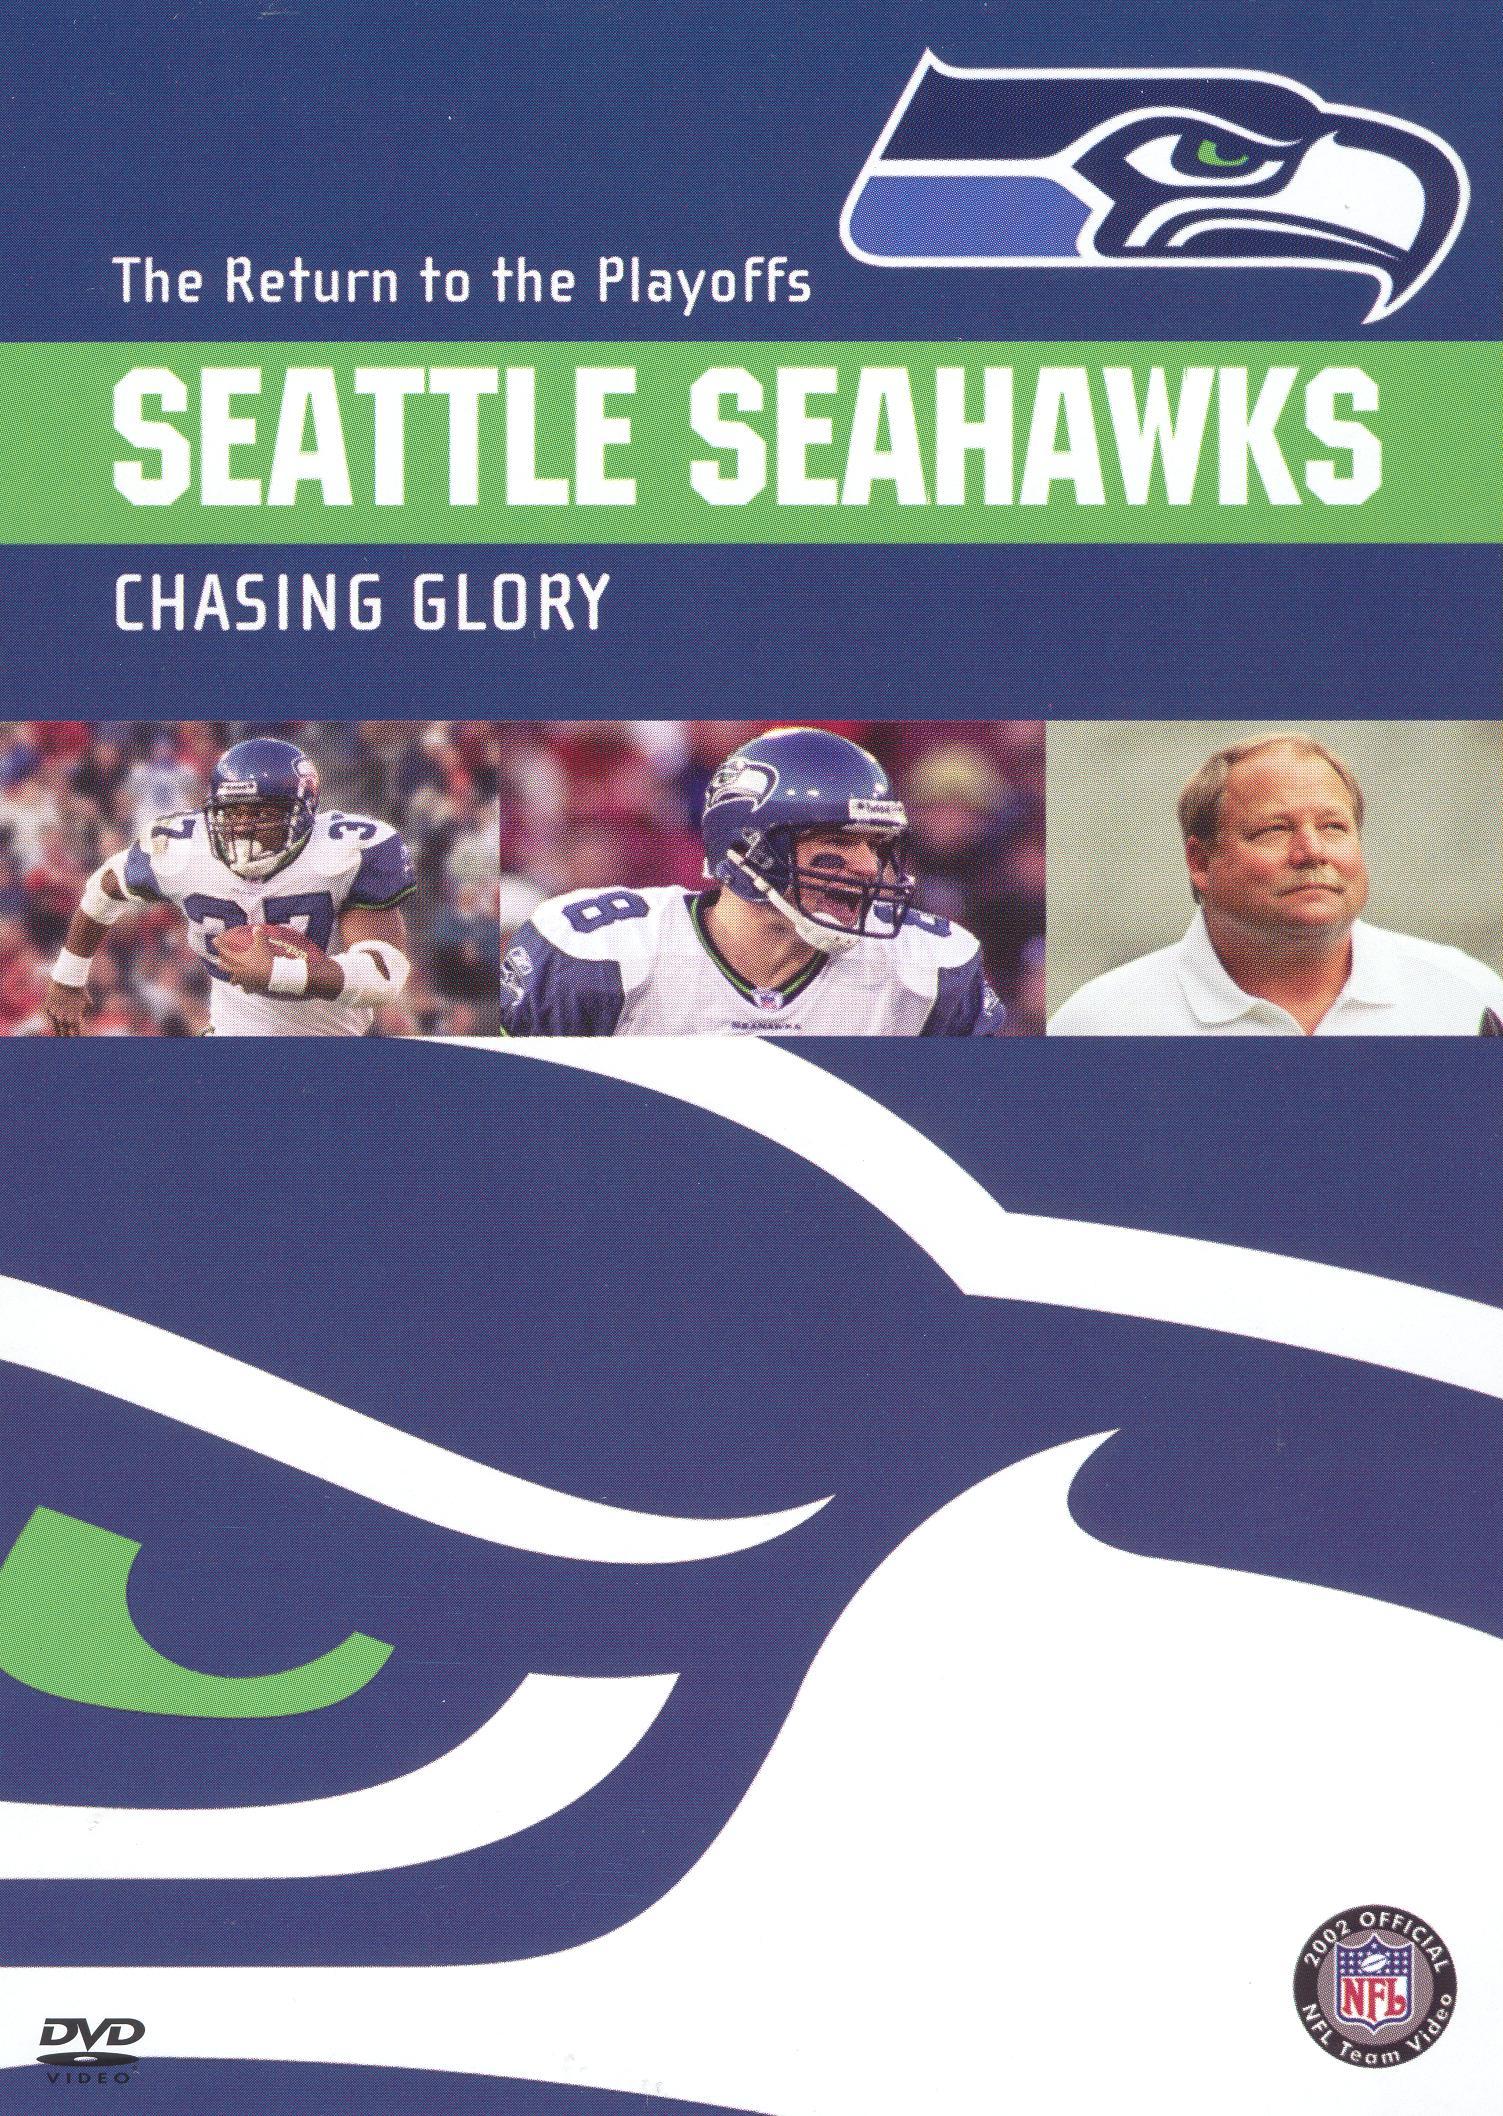 NFL: 2003 Seattle Seahawks Team Video - Chasing Glory